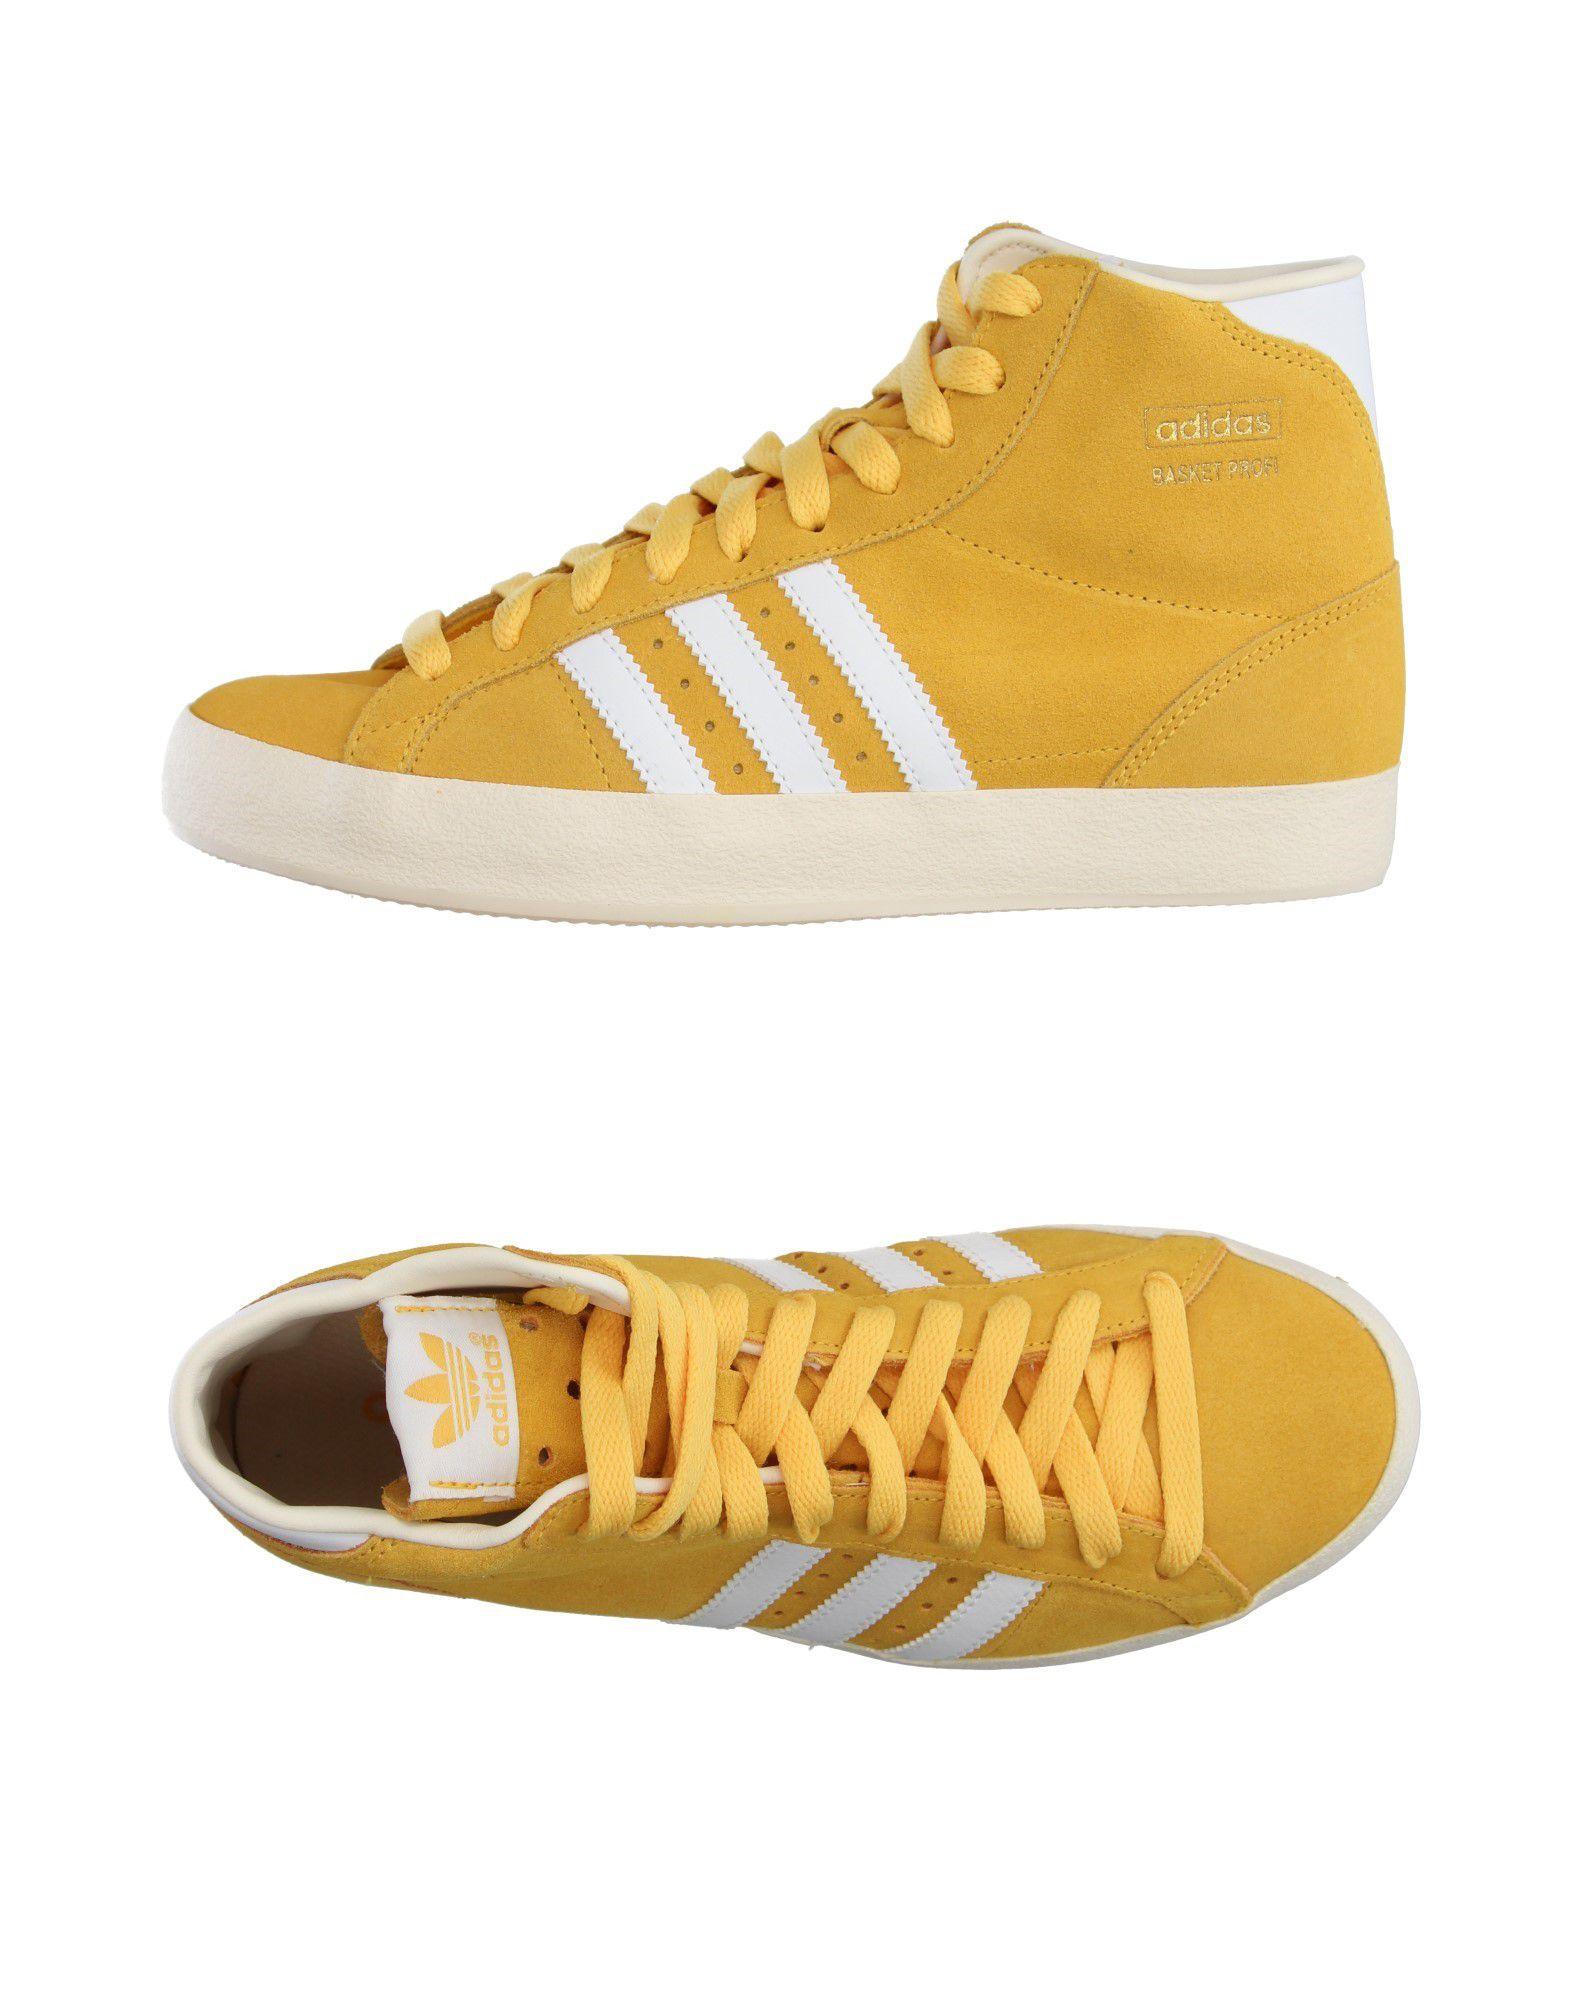 Adidas Originals Sneakers - Men Adidas  Originals Sneakers online on  Adidas Canada - 11148136CC a04498